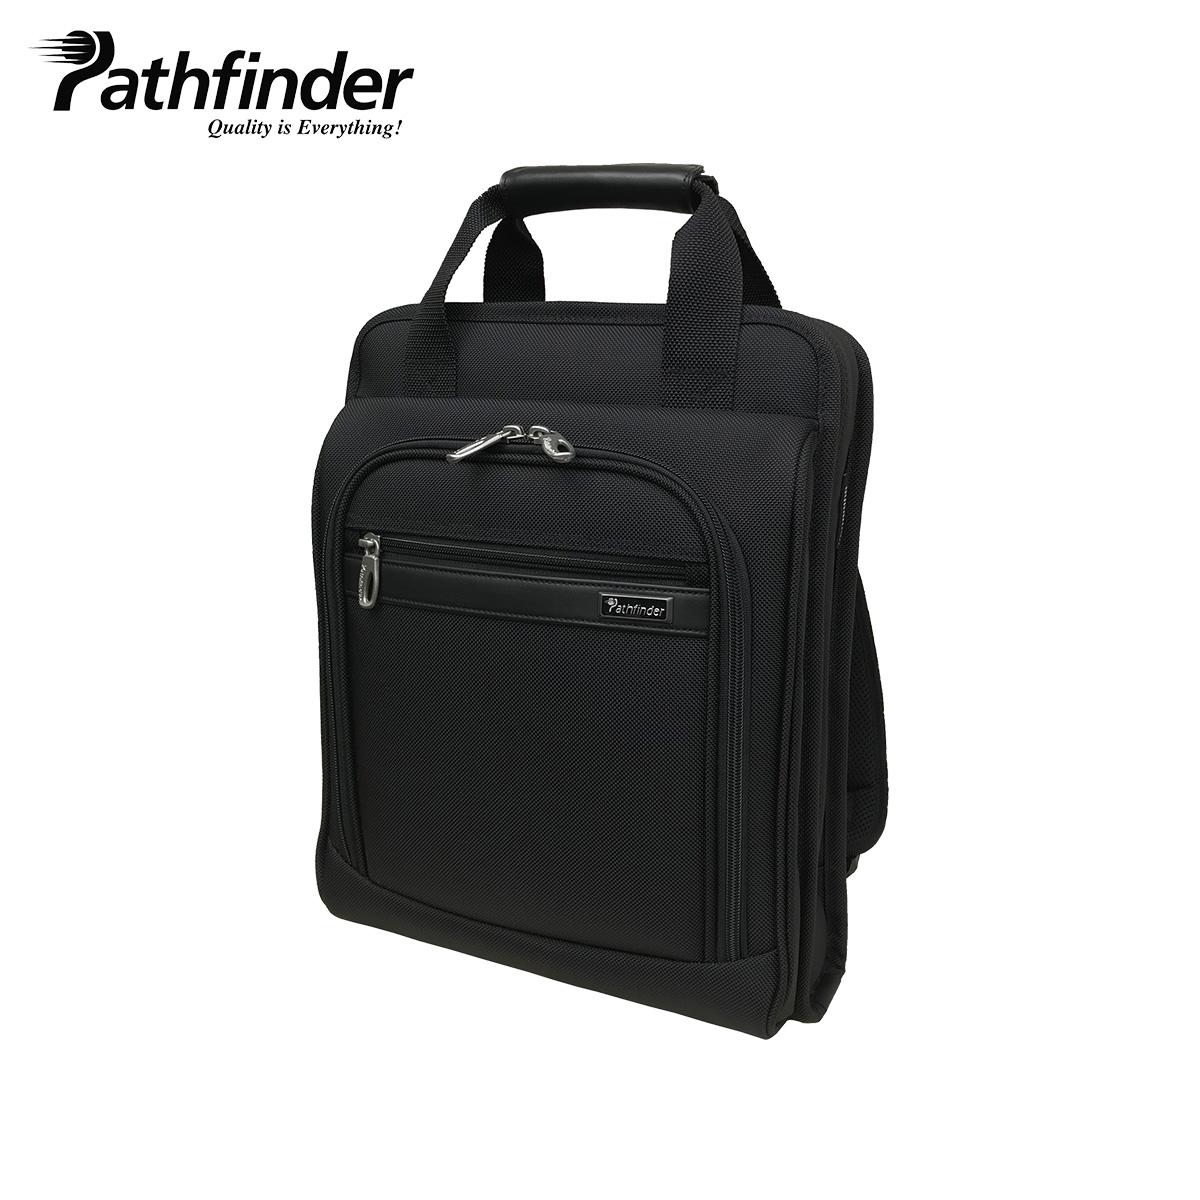 Pathfinder REVOLUTION XT パスファインダー バッグ ビジネスバッグ リュック バックパック メンズ ブラック 黒 PF6814B